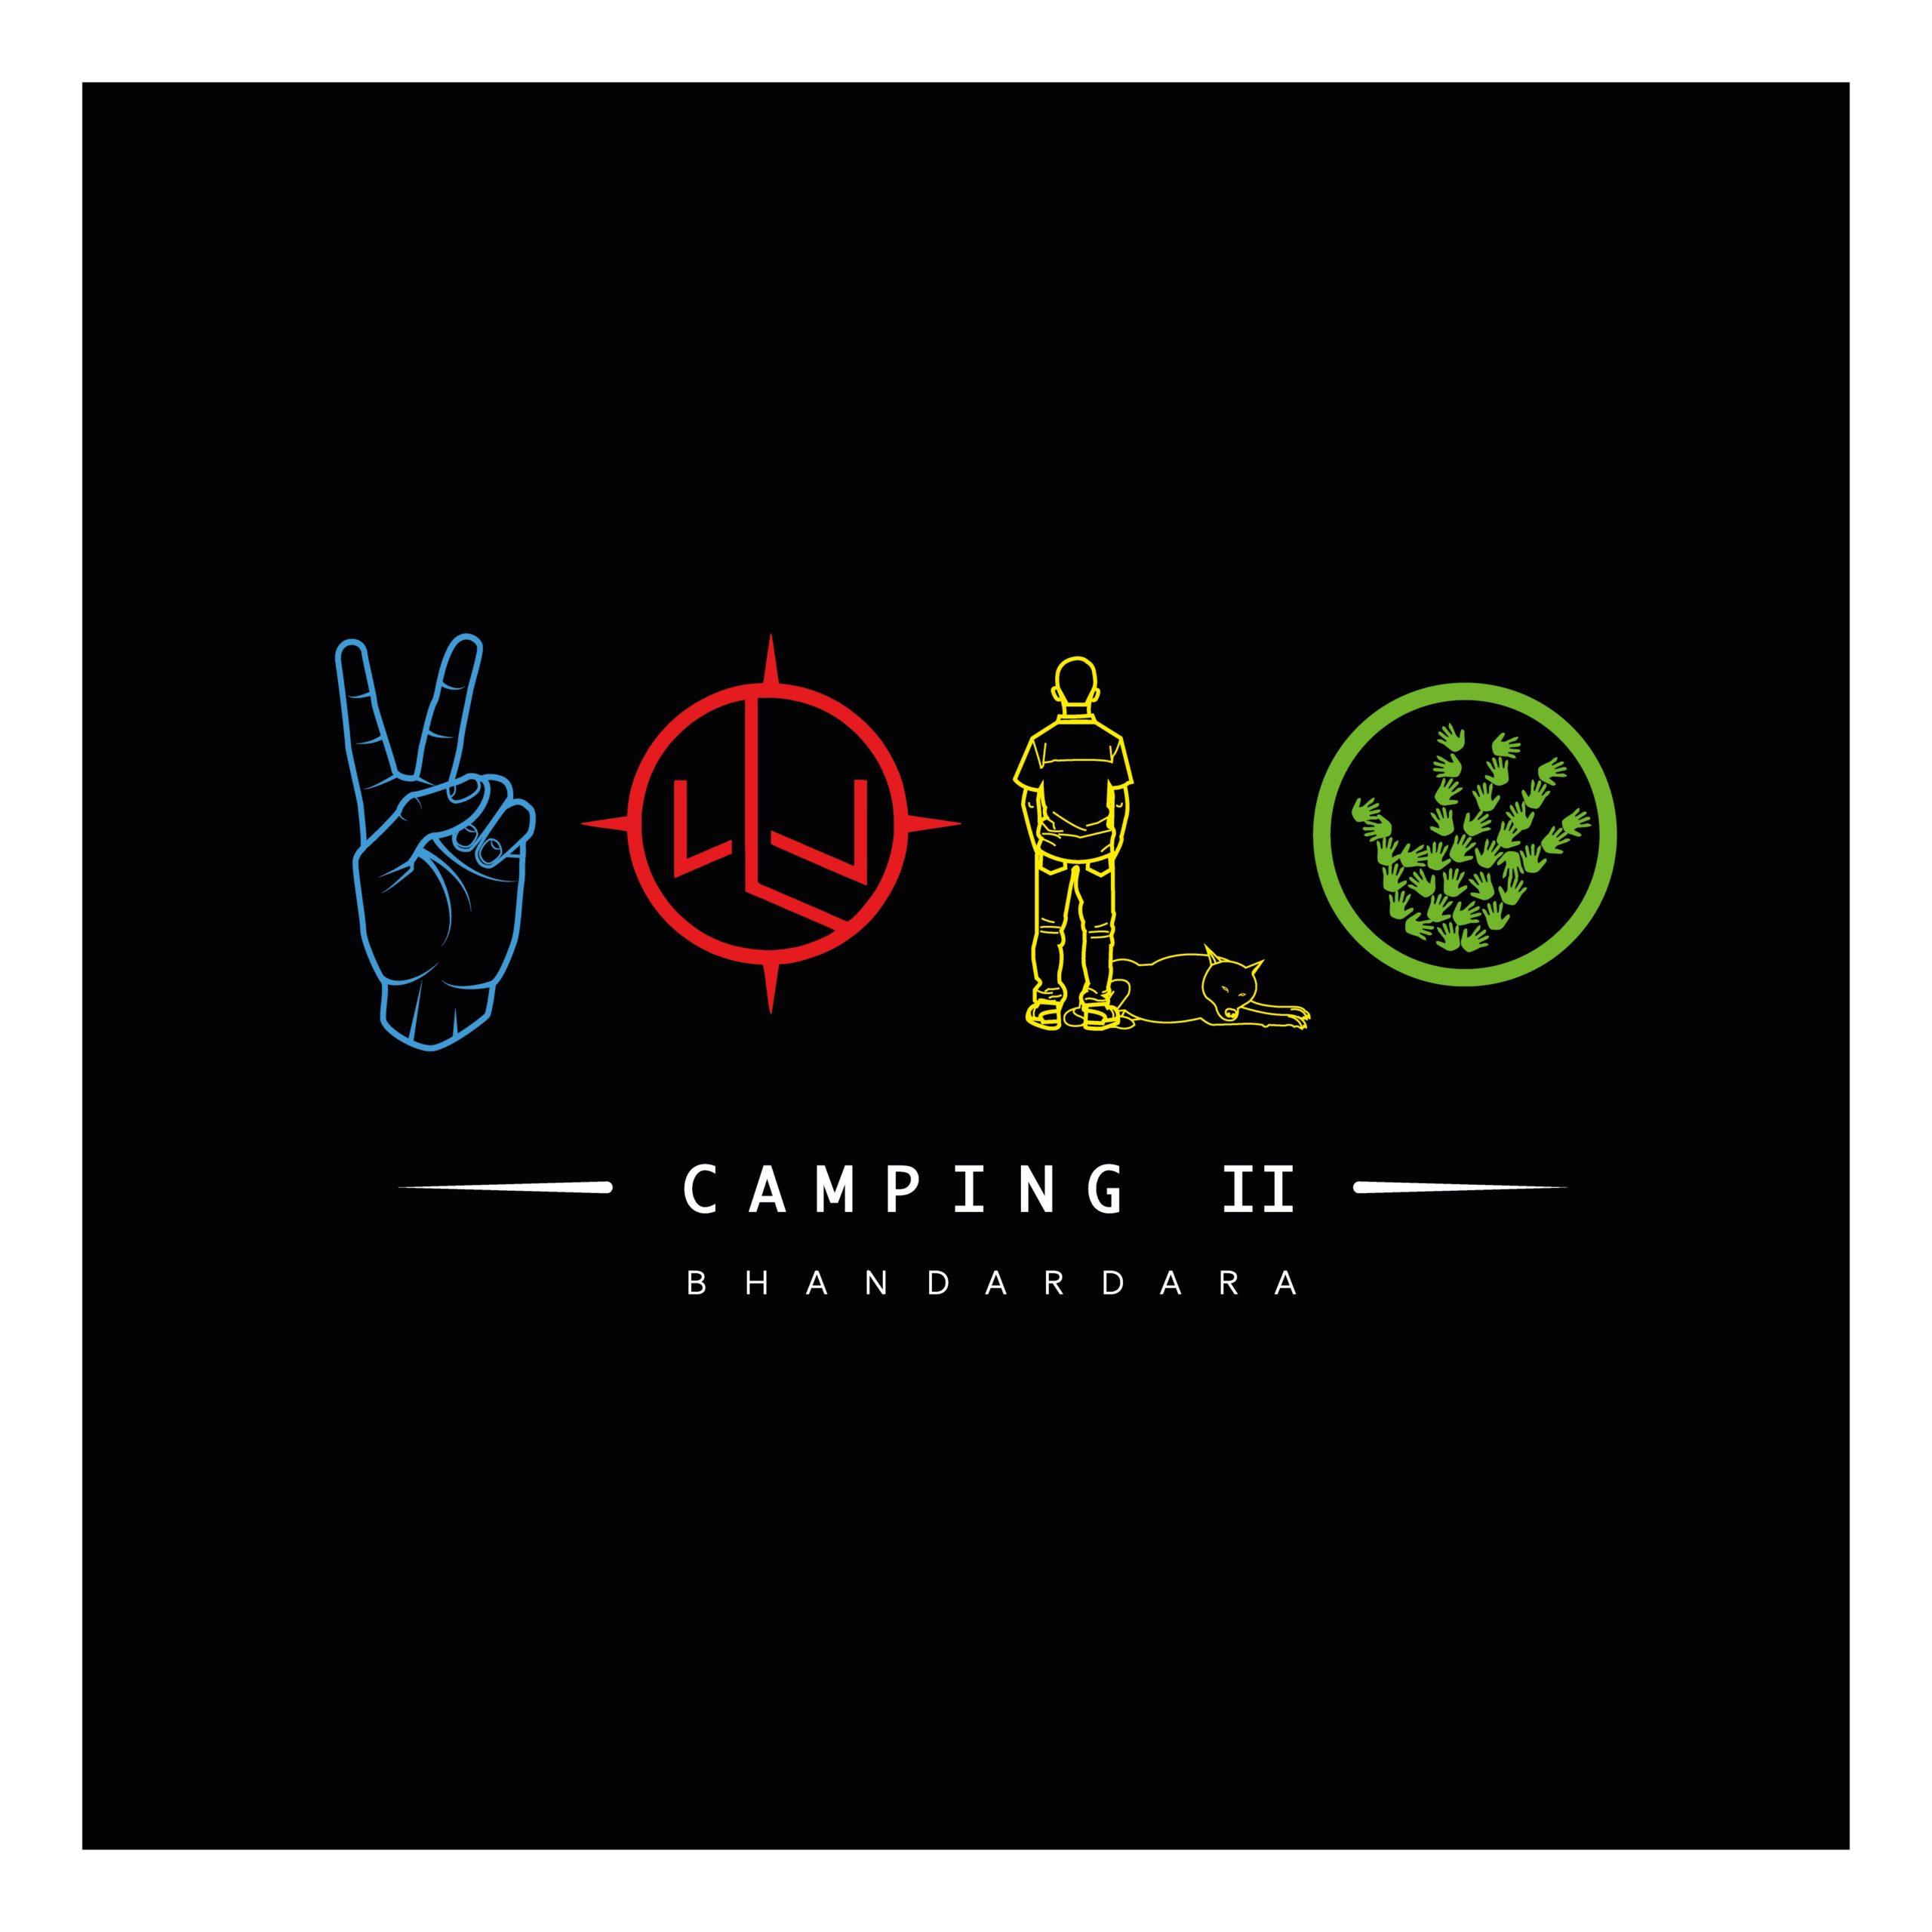 Yolo camping 2